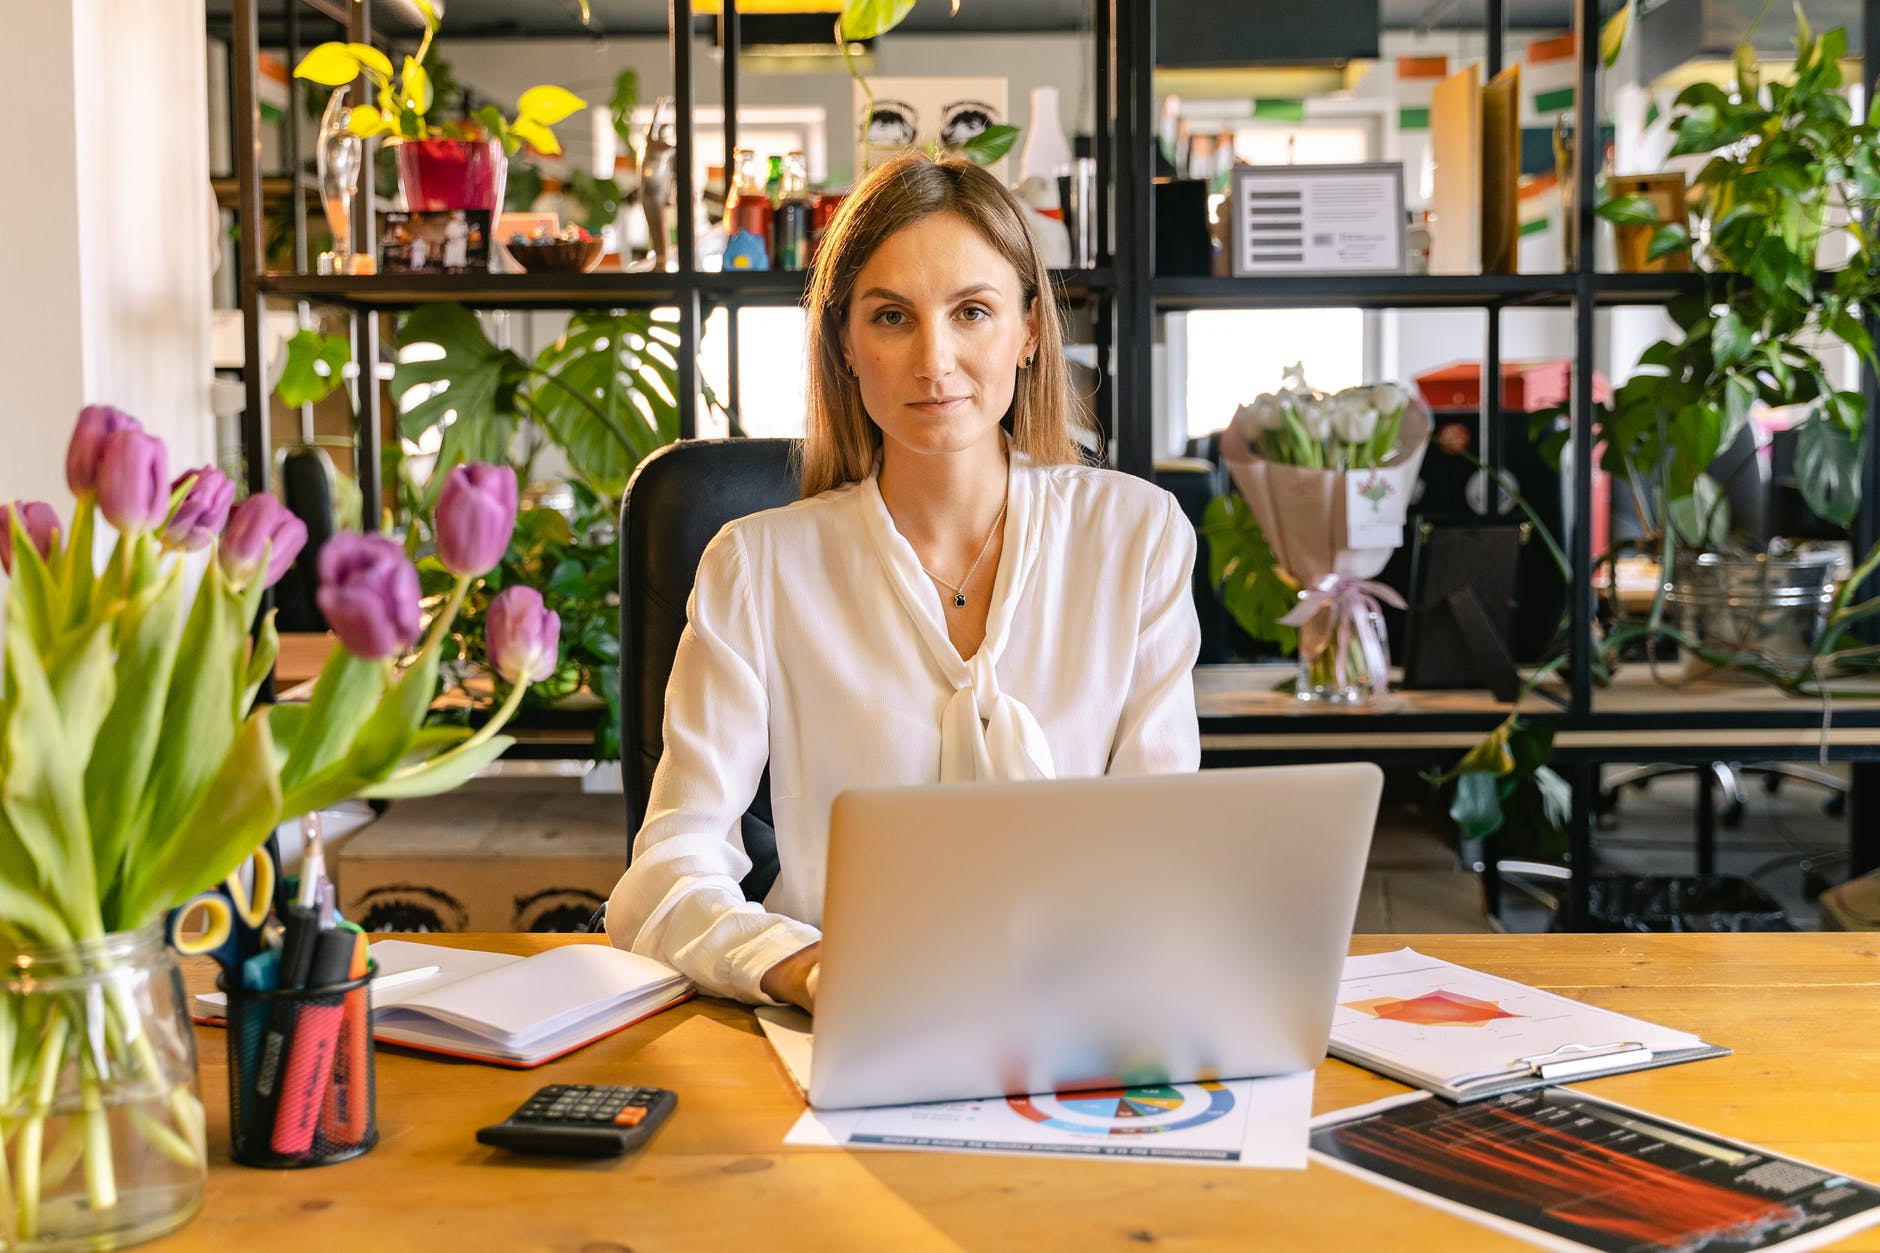 portrait shot of an employee using a laptop